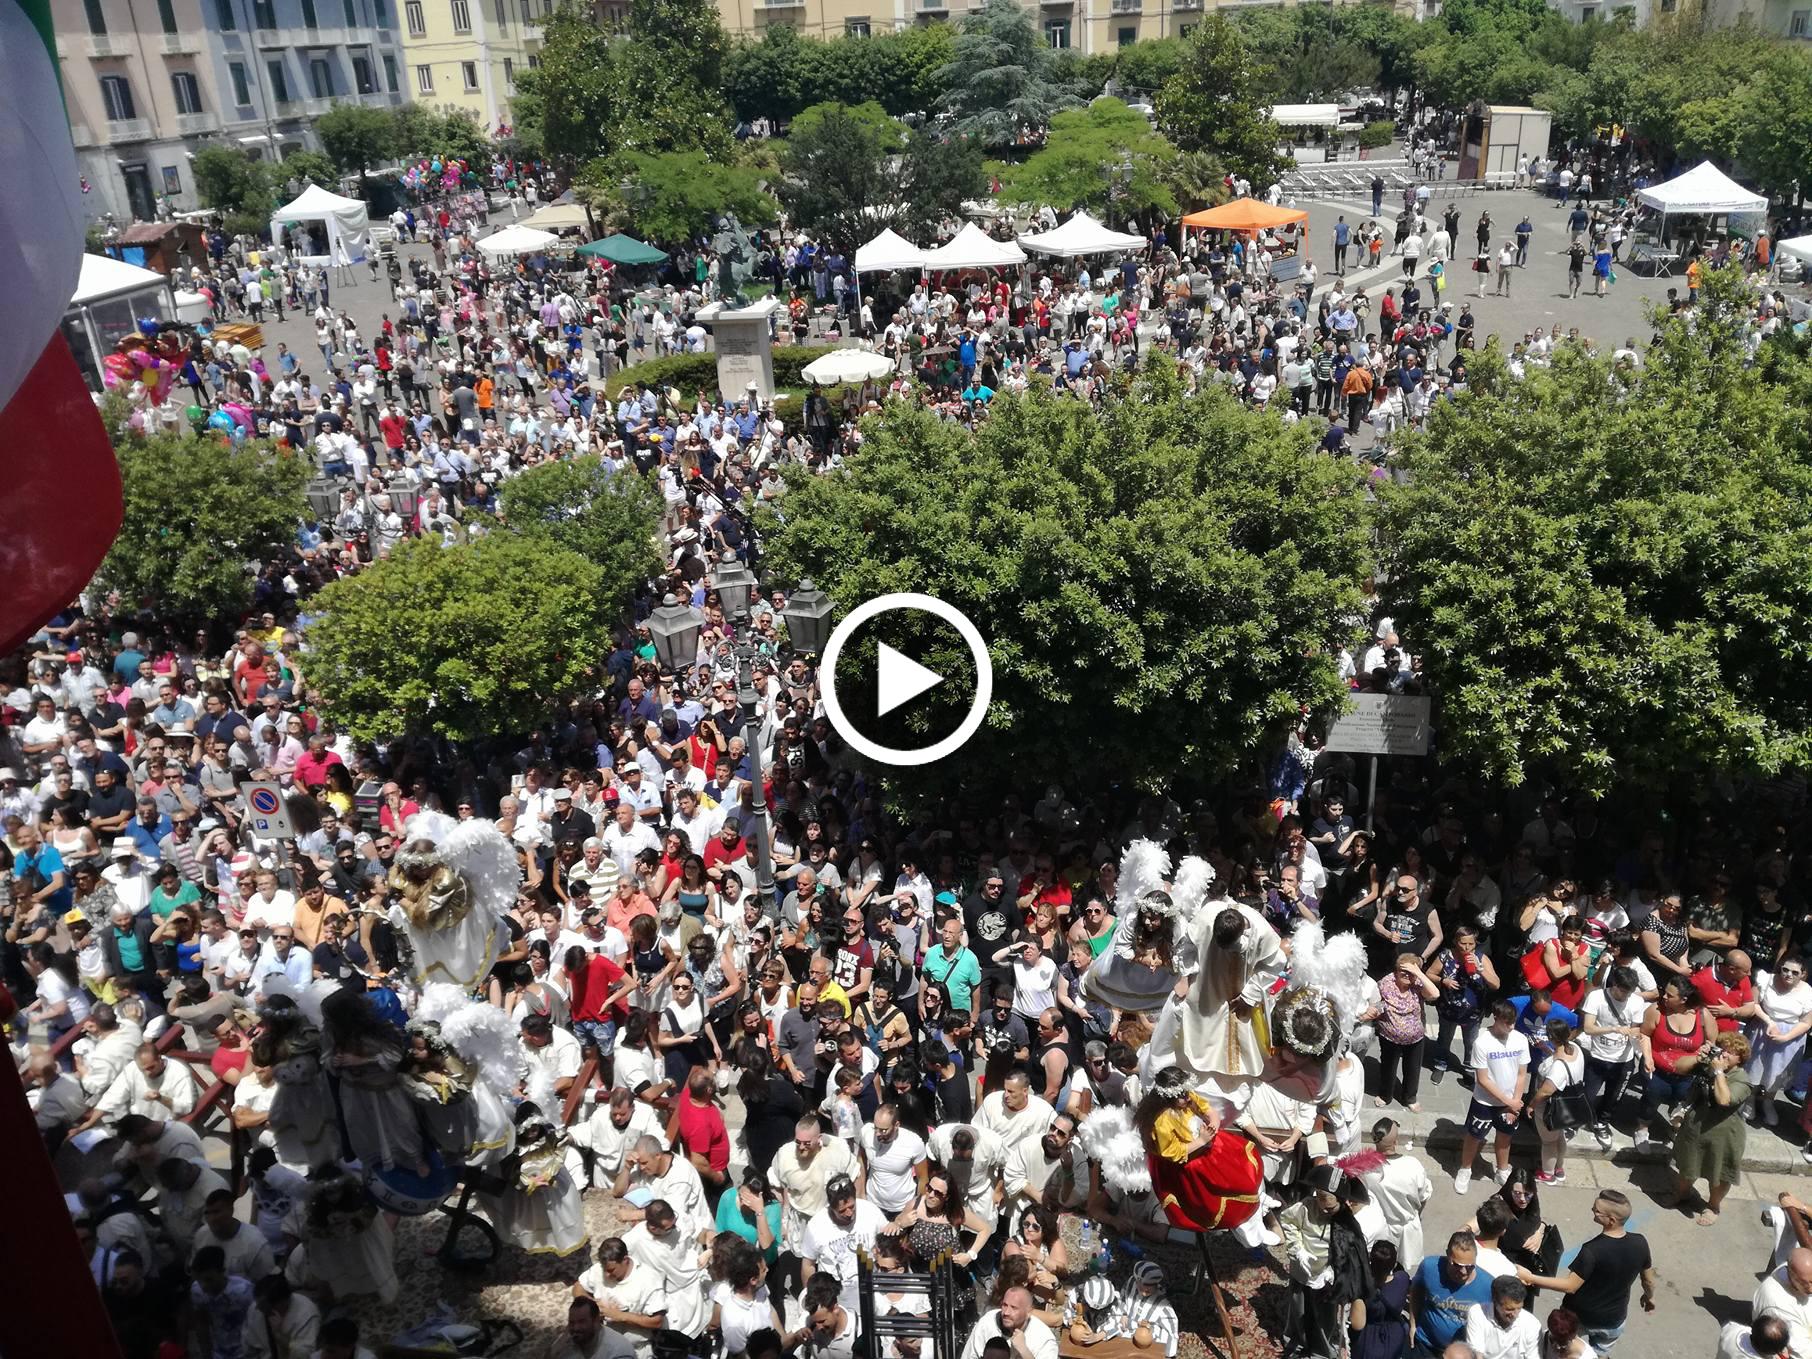 La sfilata dei Misteri 2018 (VIDEO FULL HD)